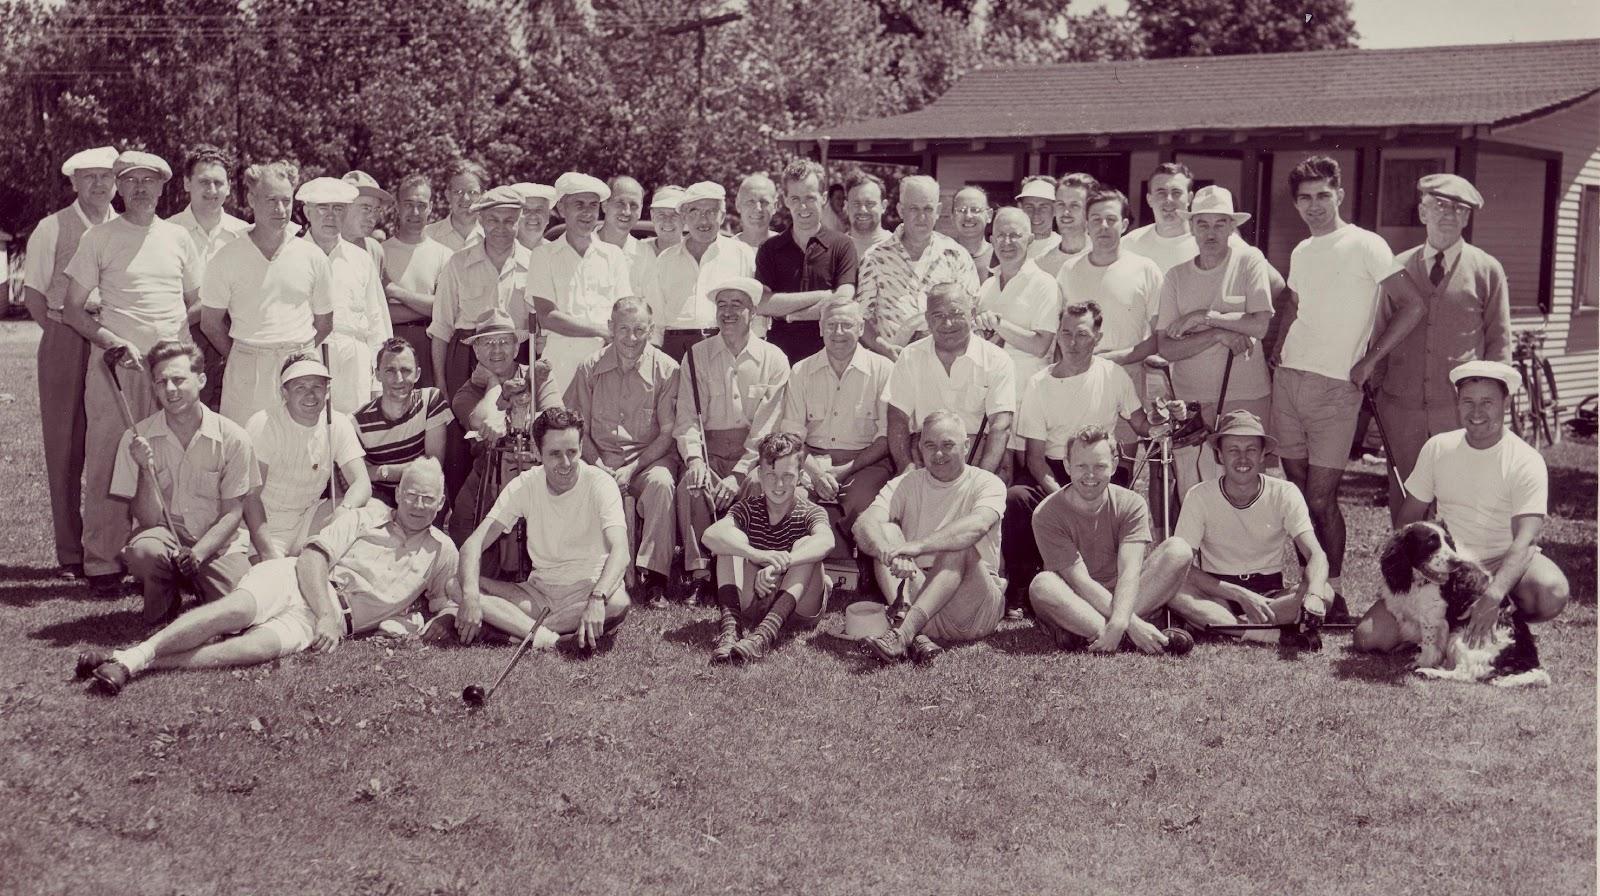 Macintosh HD:Users:BCGC:Downloads:Big cedar golfers.jpg